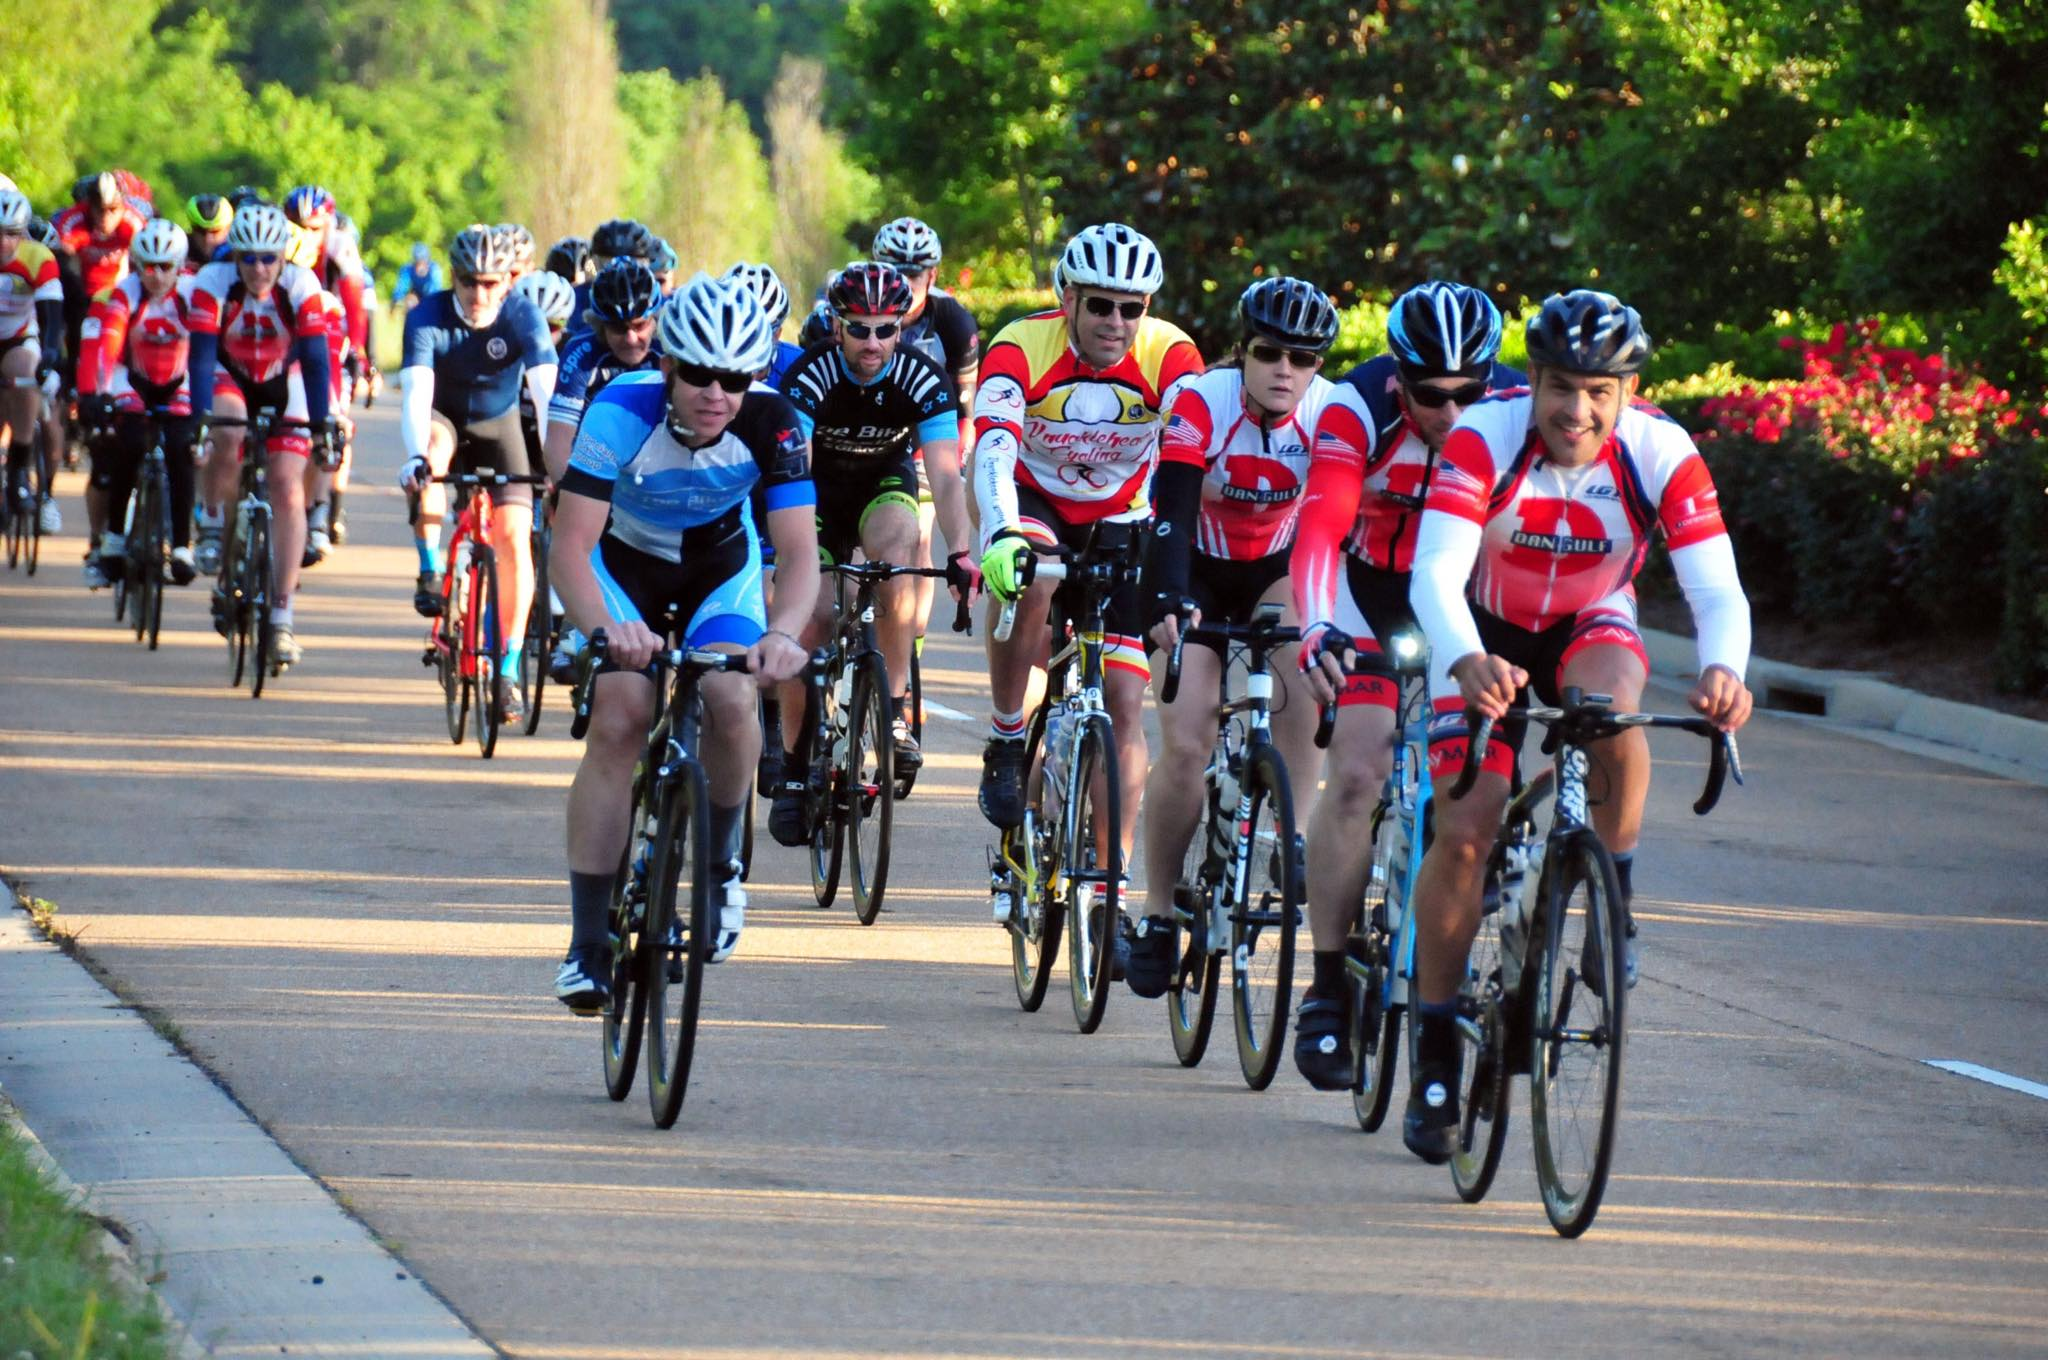 Ridgeland-Biking